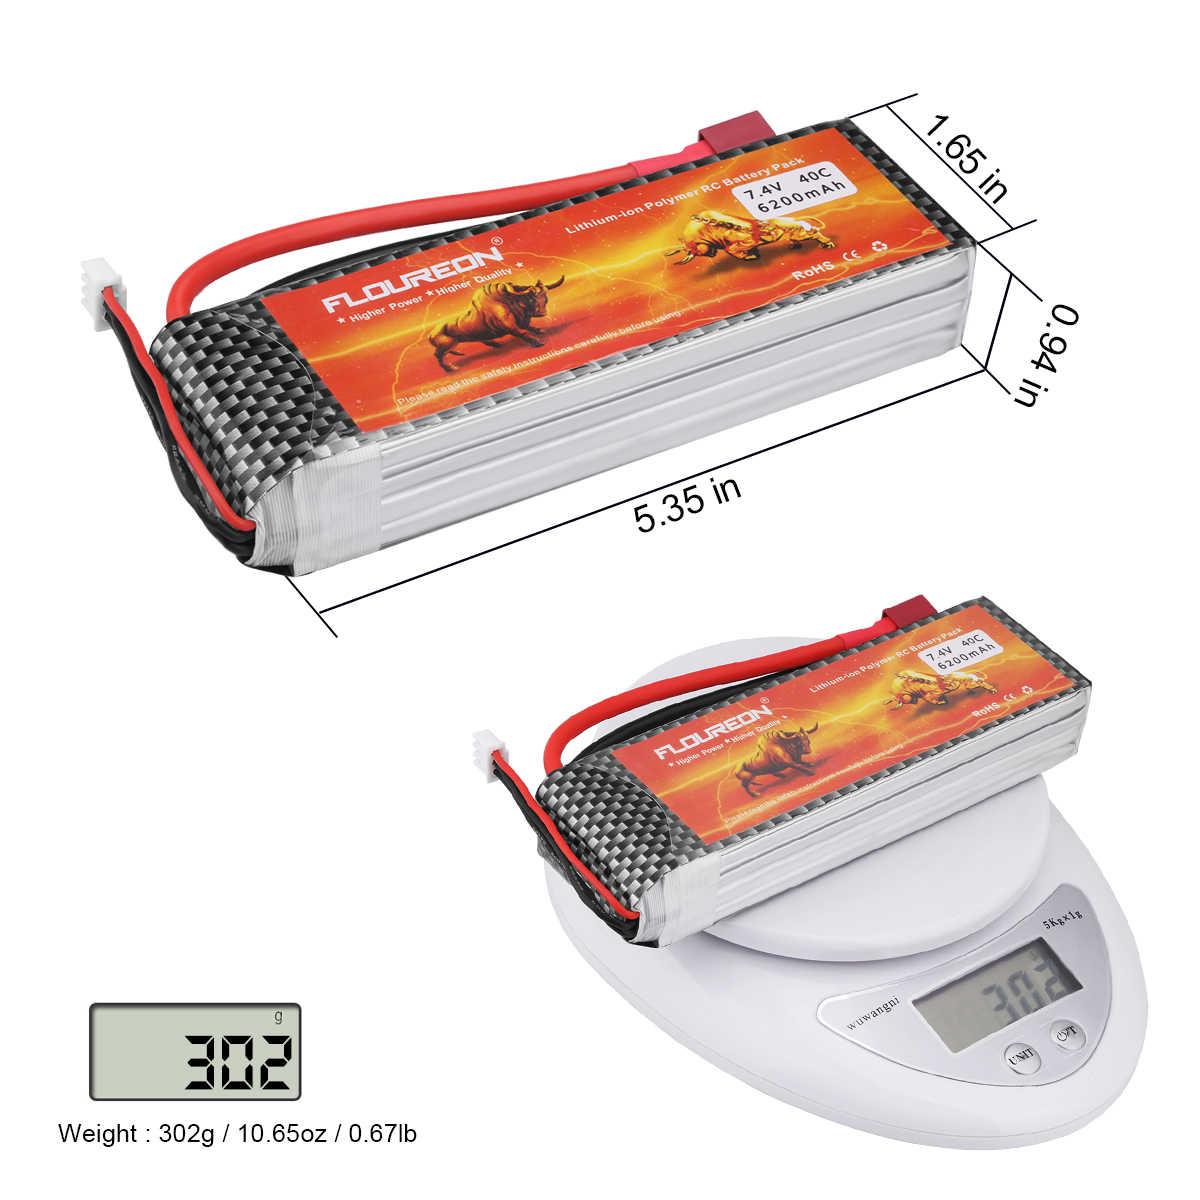 Floureon 2S2P 7,4 V 6200 mAh 40C Lipo батарея для грузовик с дистанционным управлением Багги RC игрушки (T Plug)